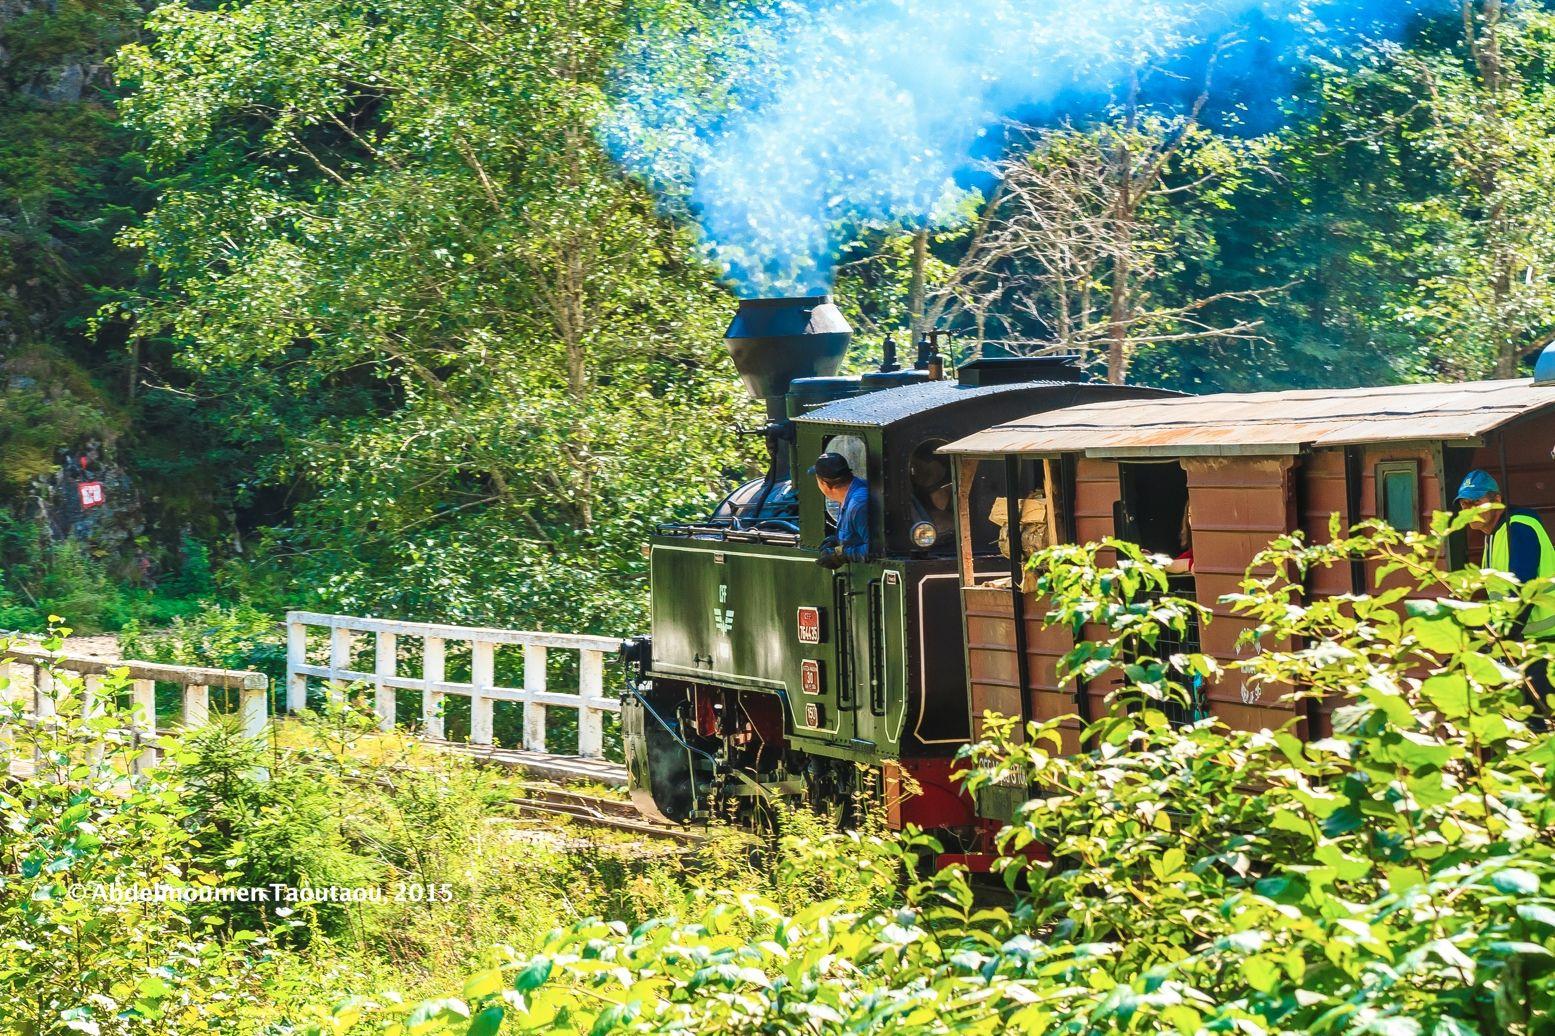 The mocanita train, in Maramures, Romania!